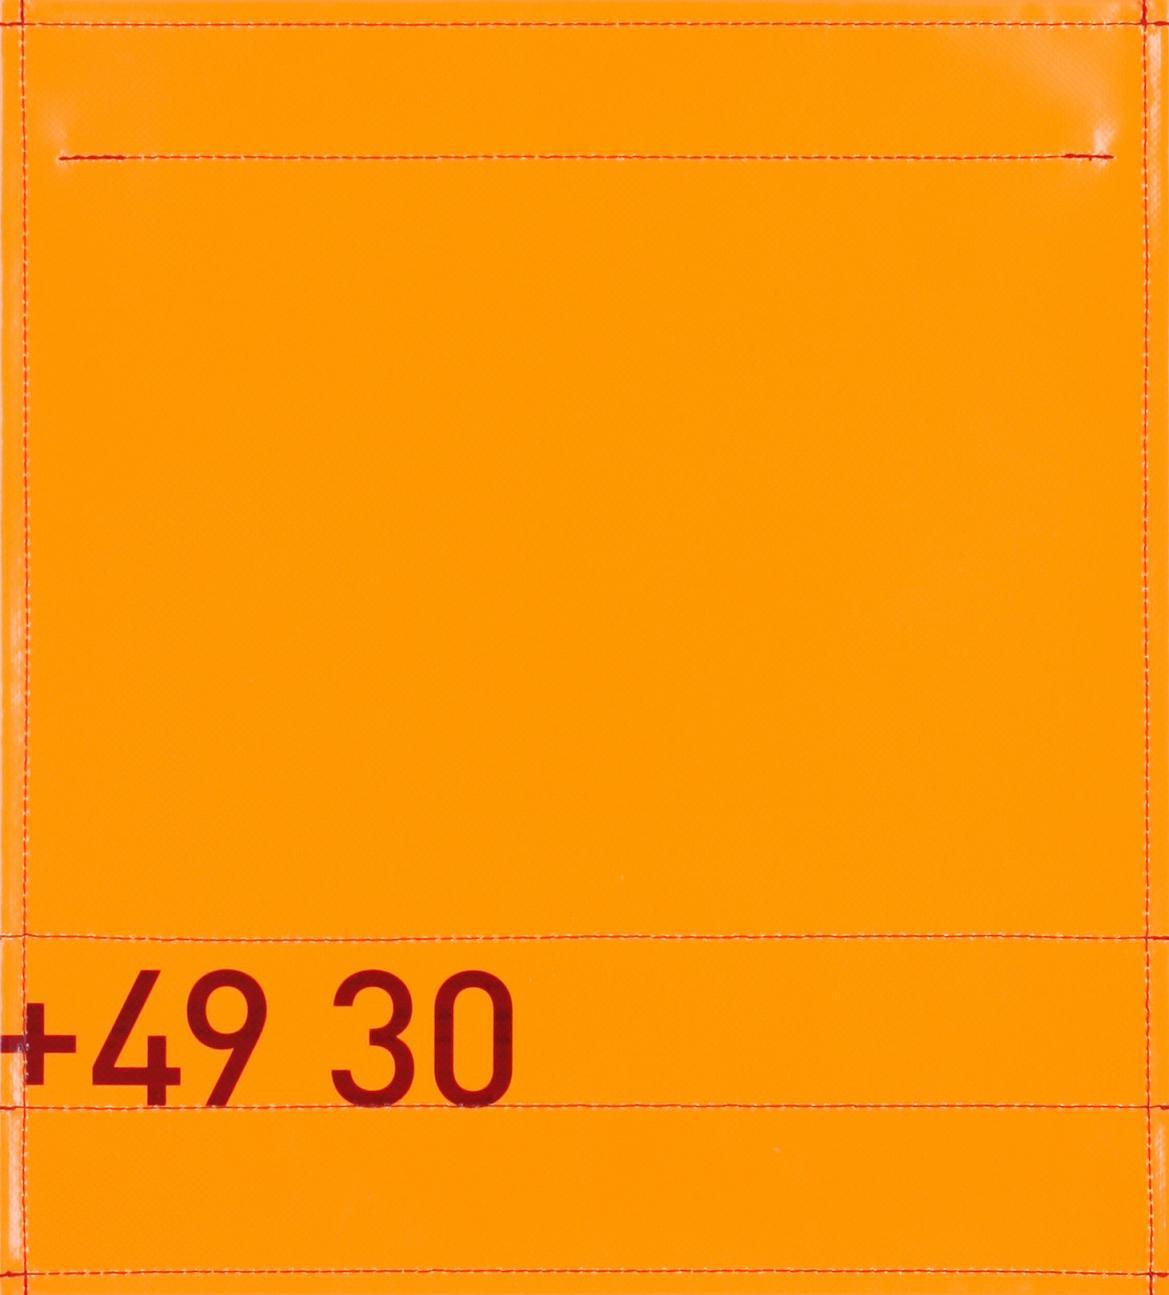 49 30 orange (mittel)